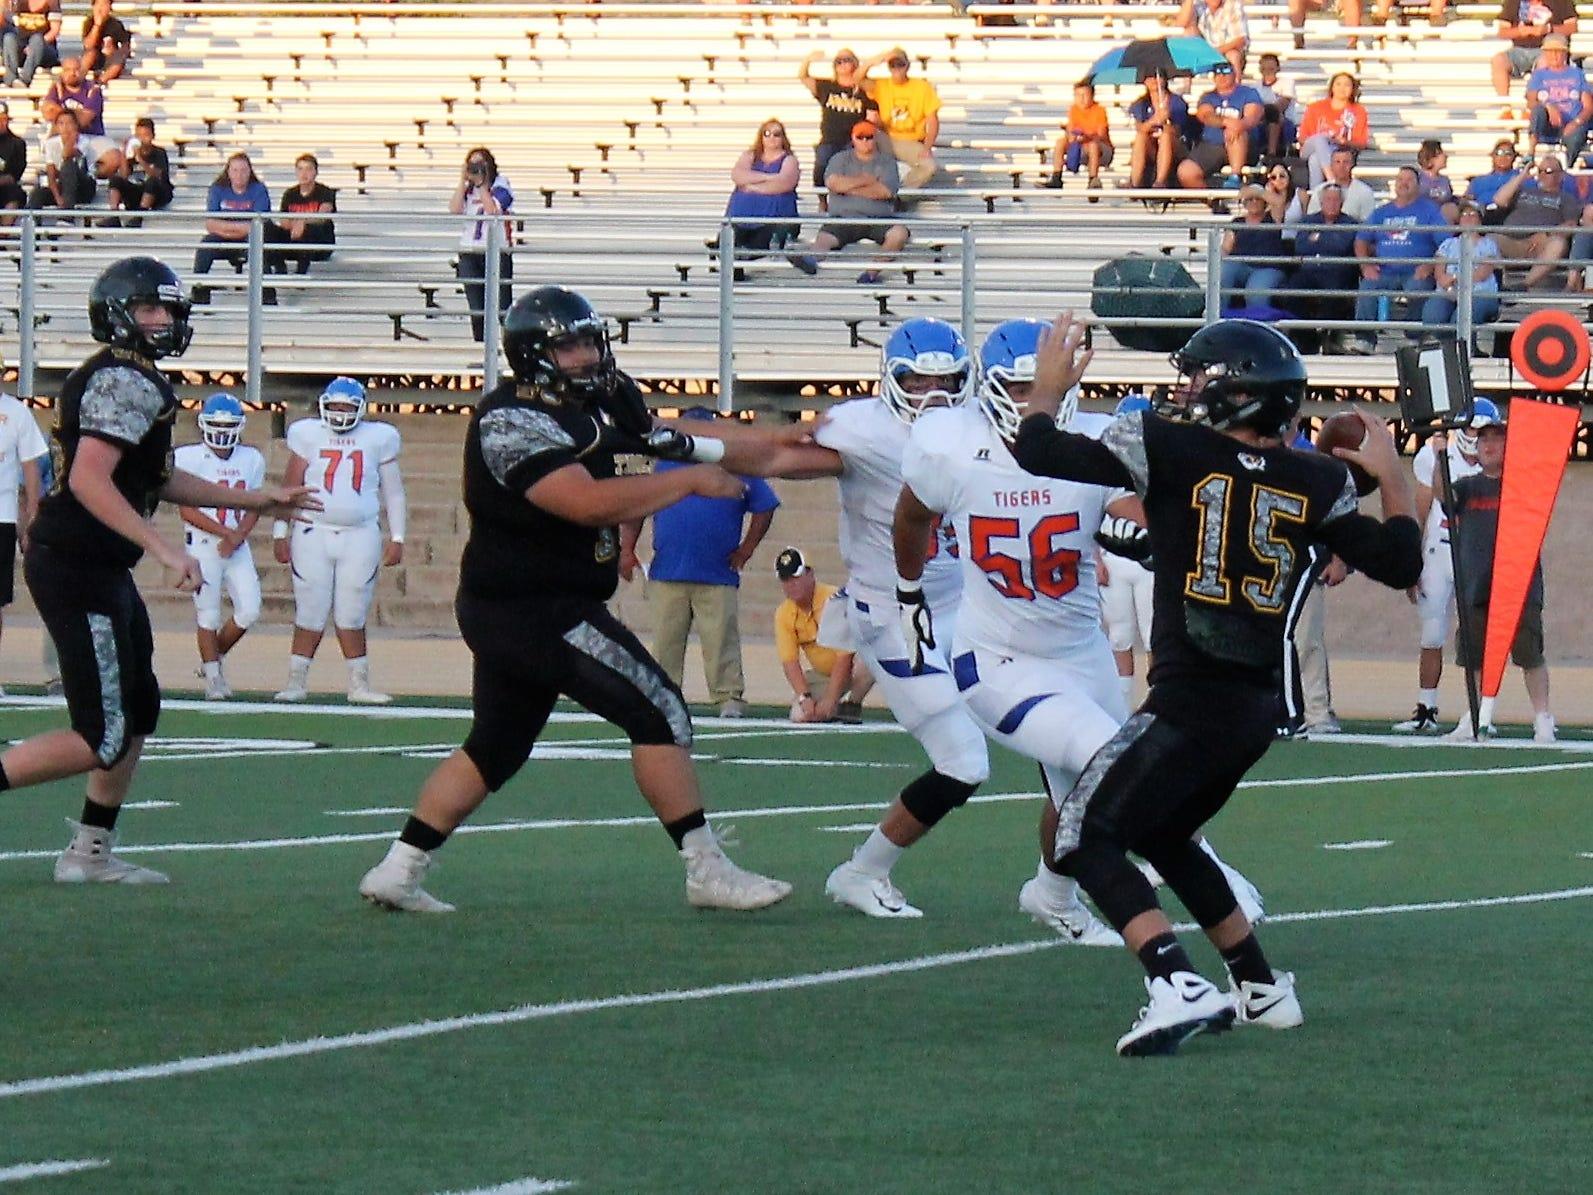 Alamogordo Tigers quarterback Bradon Martin prepares to throw the ball at Friday night's game against Los Lunas.